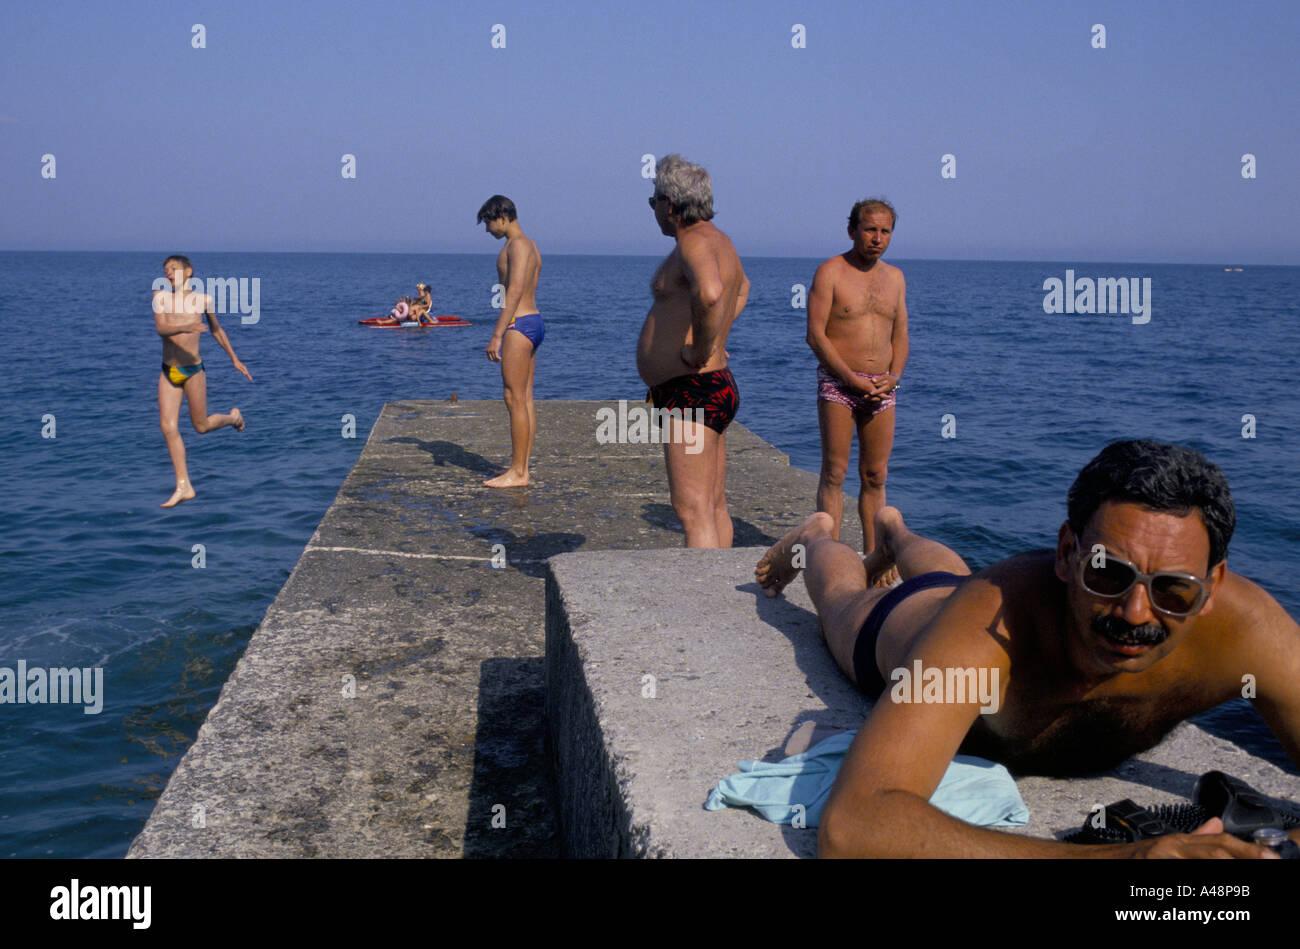 Holidaymakers sunbathing on Yalta beach crimea ukraine - Stock Image